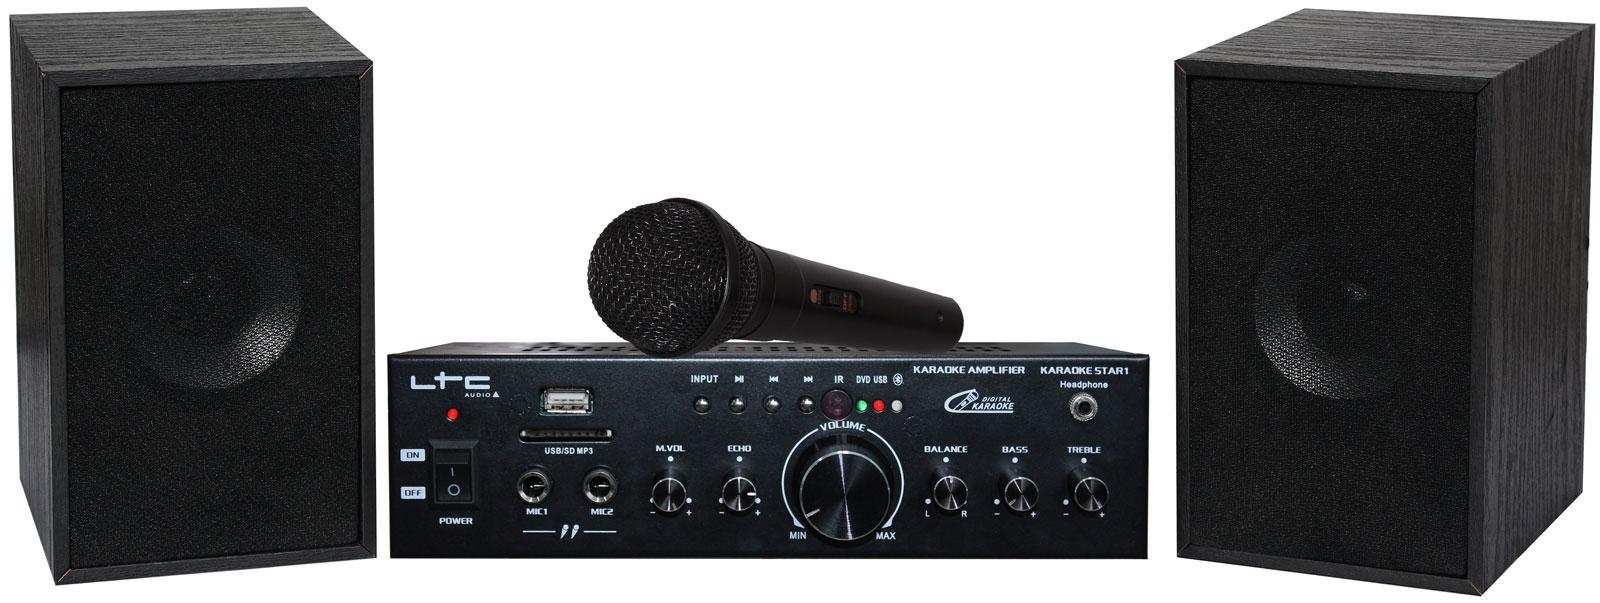 Ltc Audio Karaoke-star1mkii